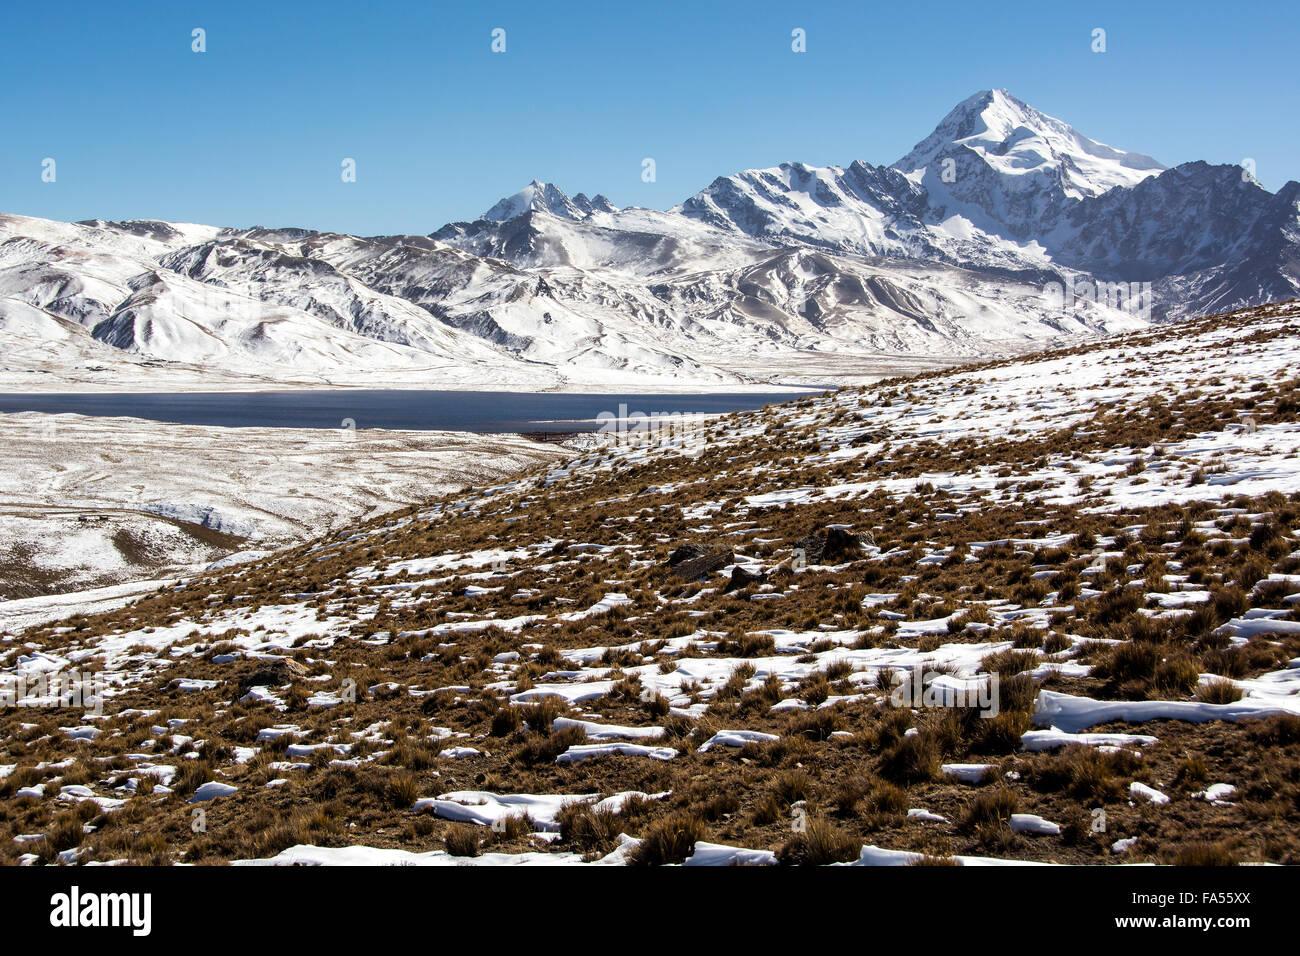 Huayna Potosi, 6088m, summit with snow, snow, Andes near La Paz, Bolivia - Stock Image